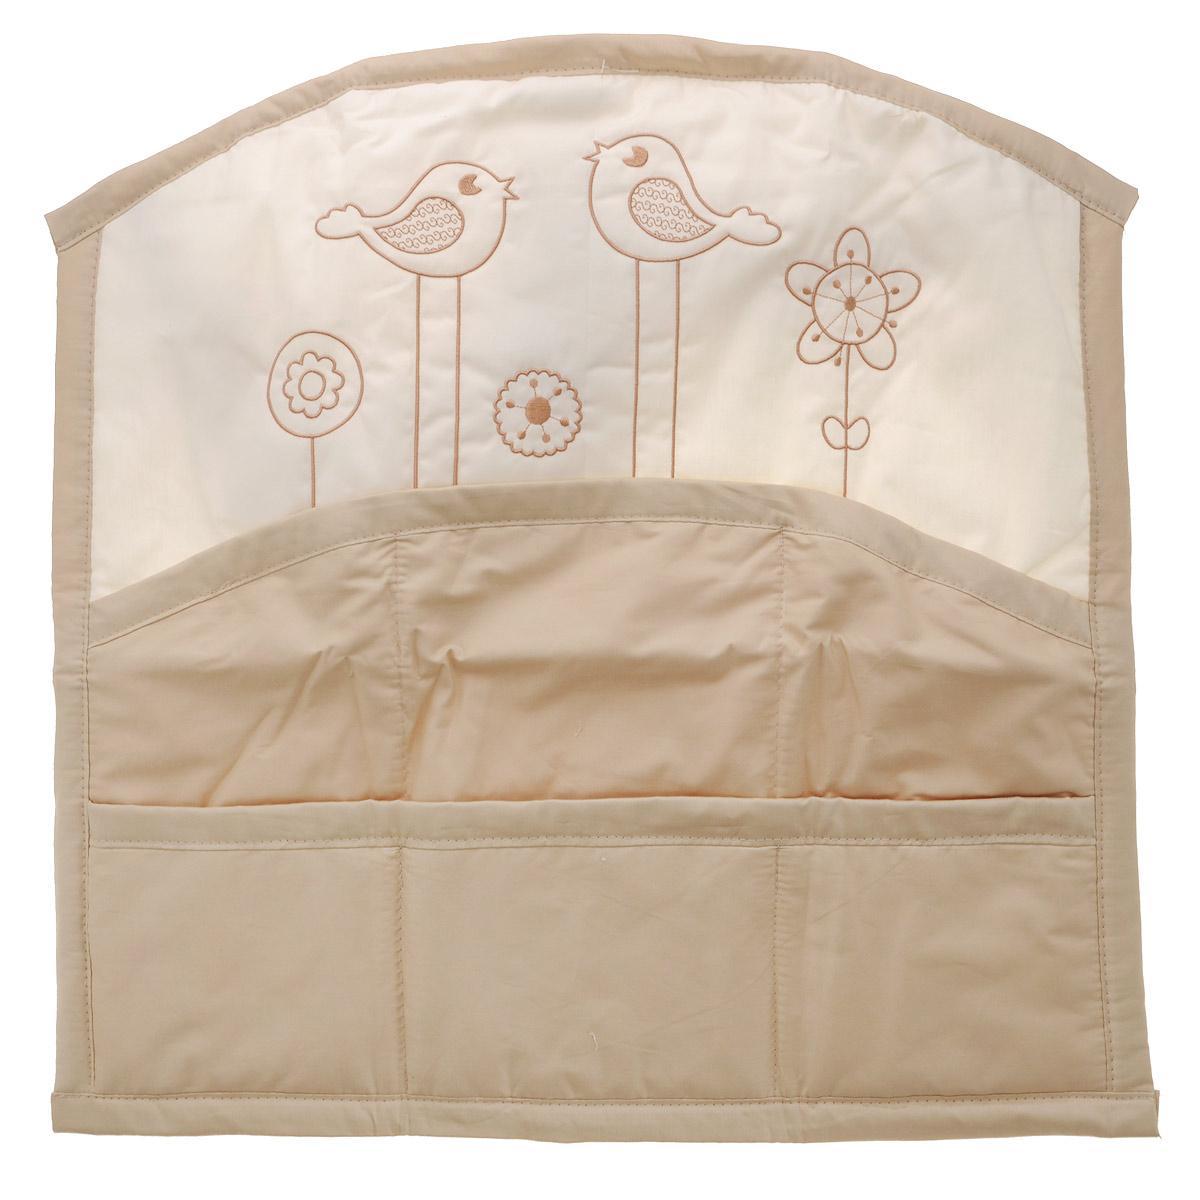 "Fairy (ВПК) Карман на кроватку Fairy ""Волшебная полянка"", цвет: белый, бежевый, 59 см х 60 см 1017.13"